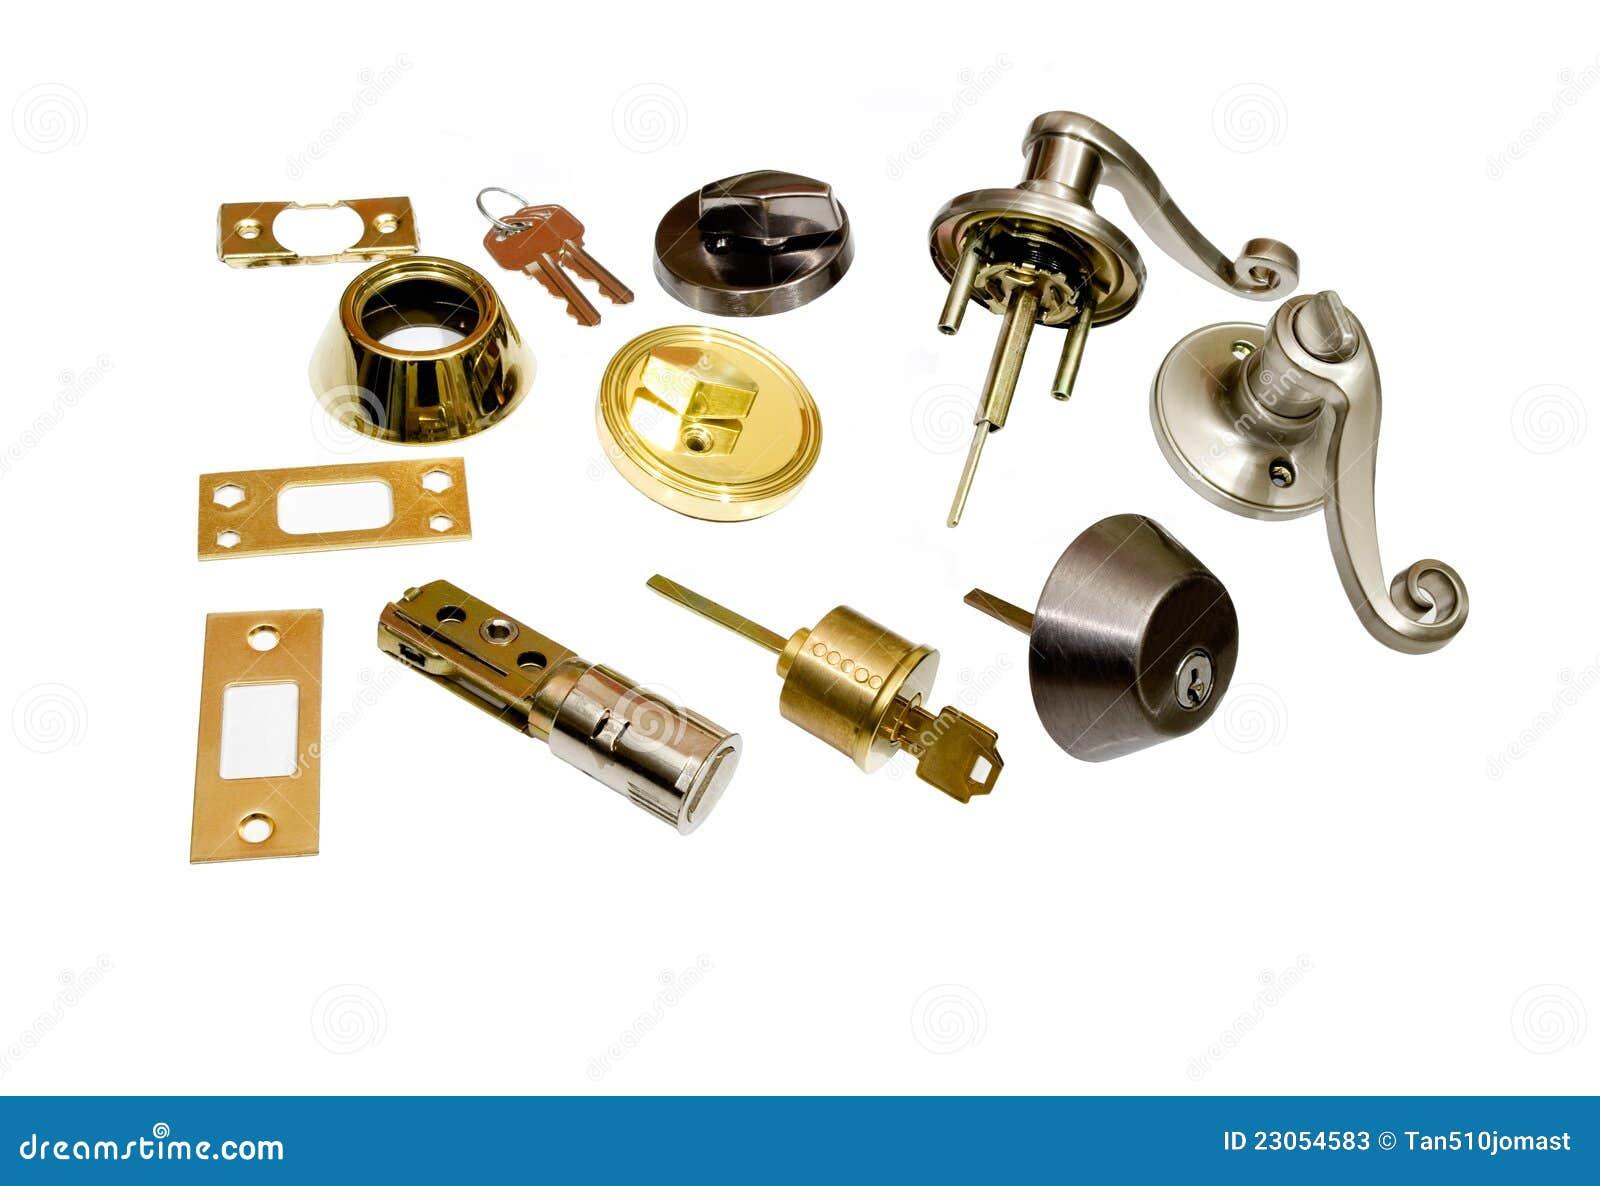 Home Hardware Locksmith Doors And Locks Stock Photos